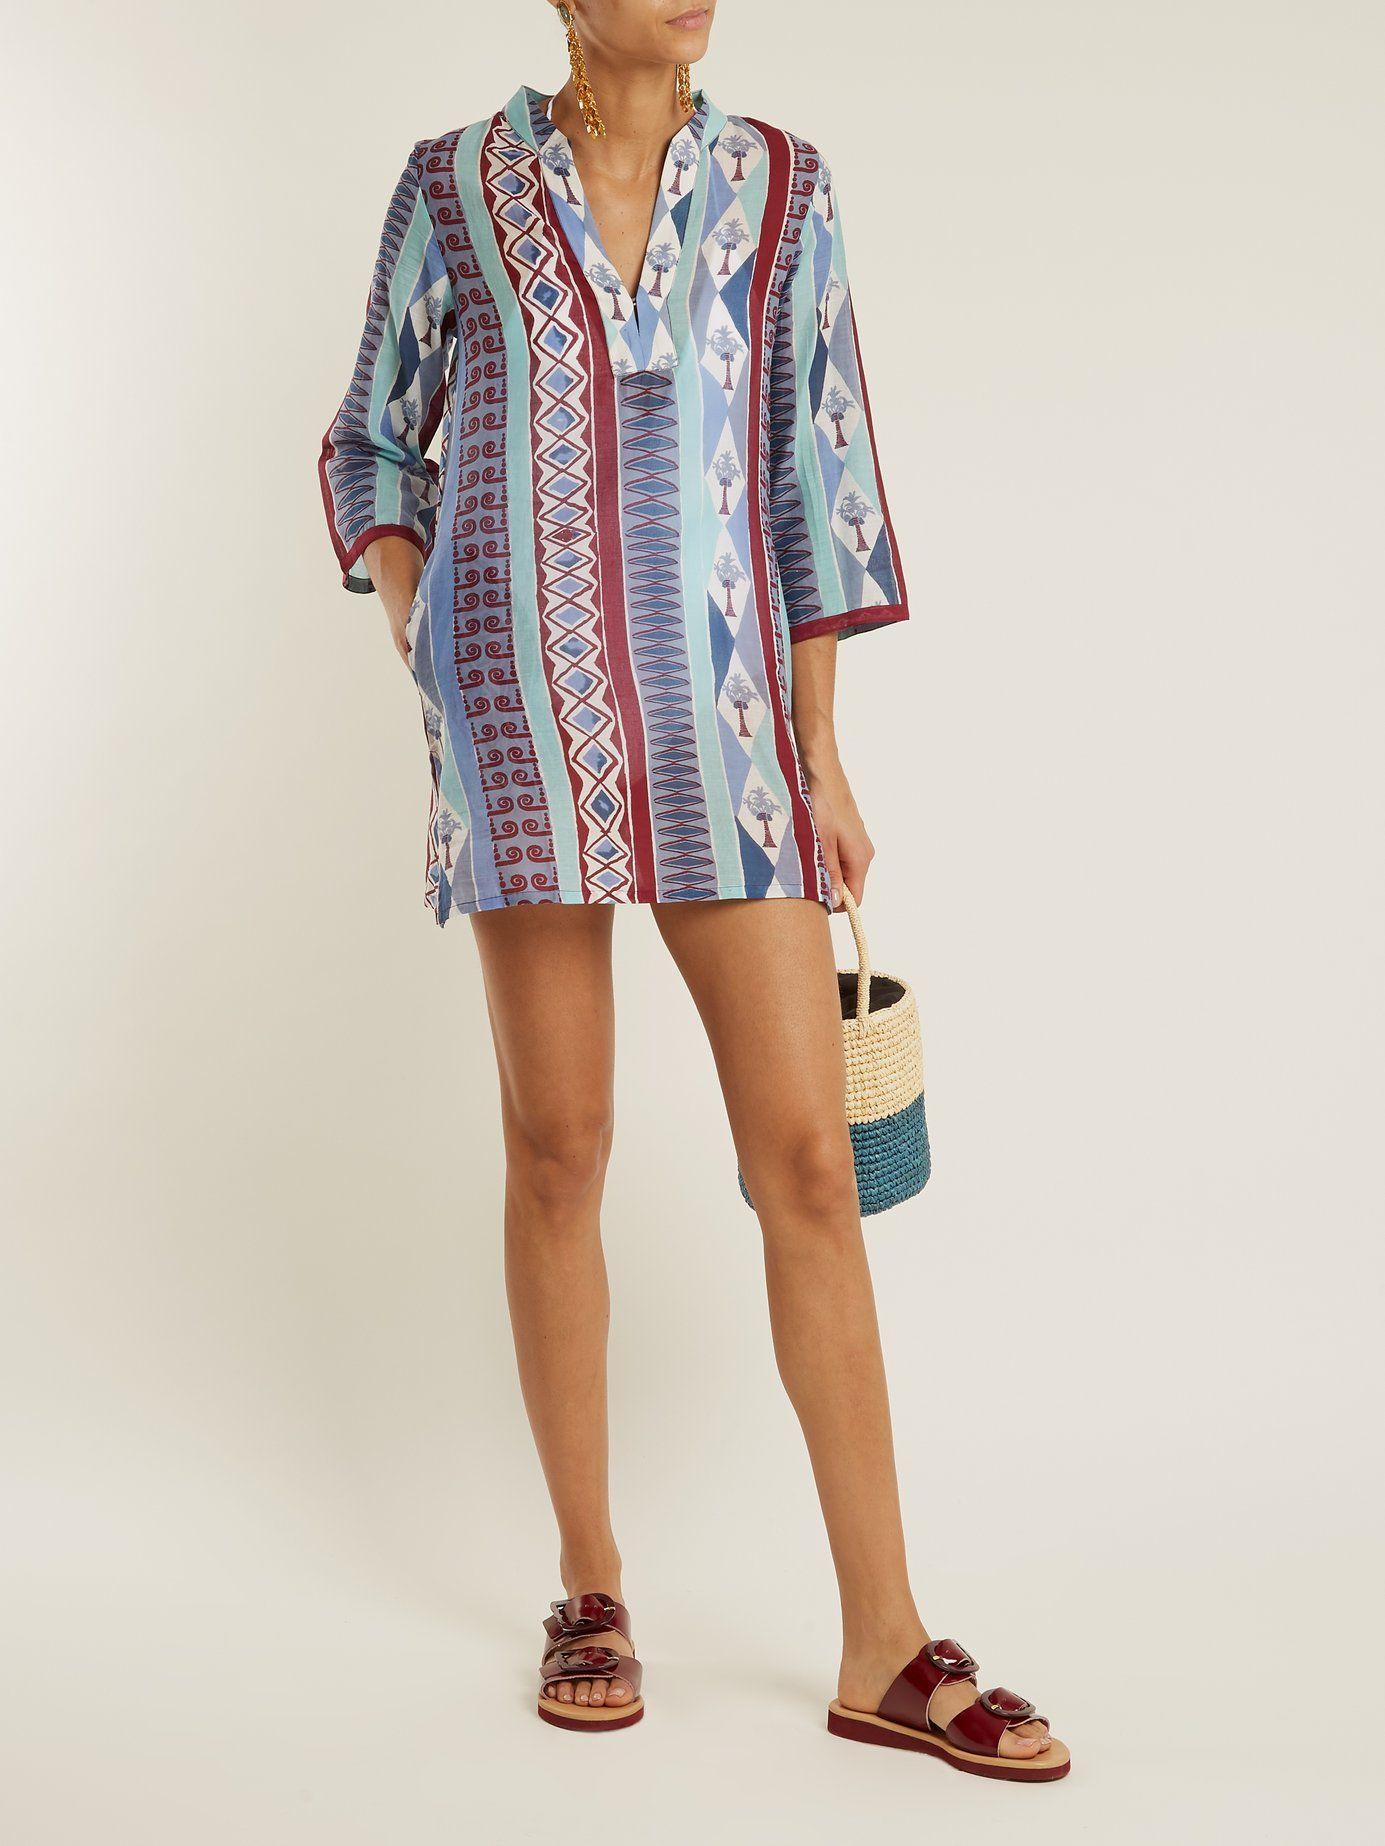 Gretta Arlechino-print cotton dress Emporio Sirenuse RnTRHnf4